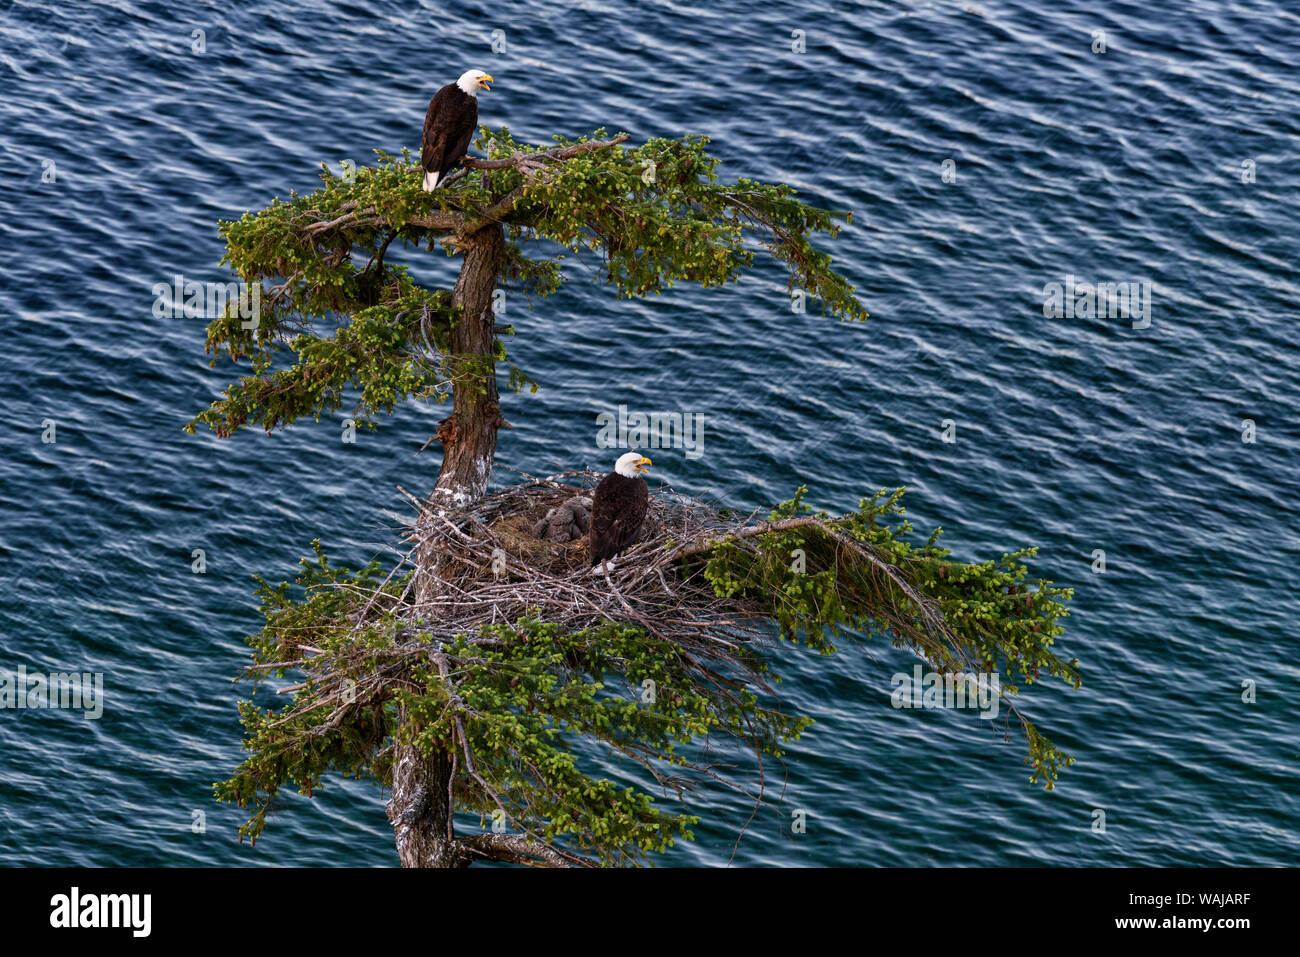 Canada, British Columbia. Bald eagles nest above the ocean. Stock Photo